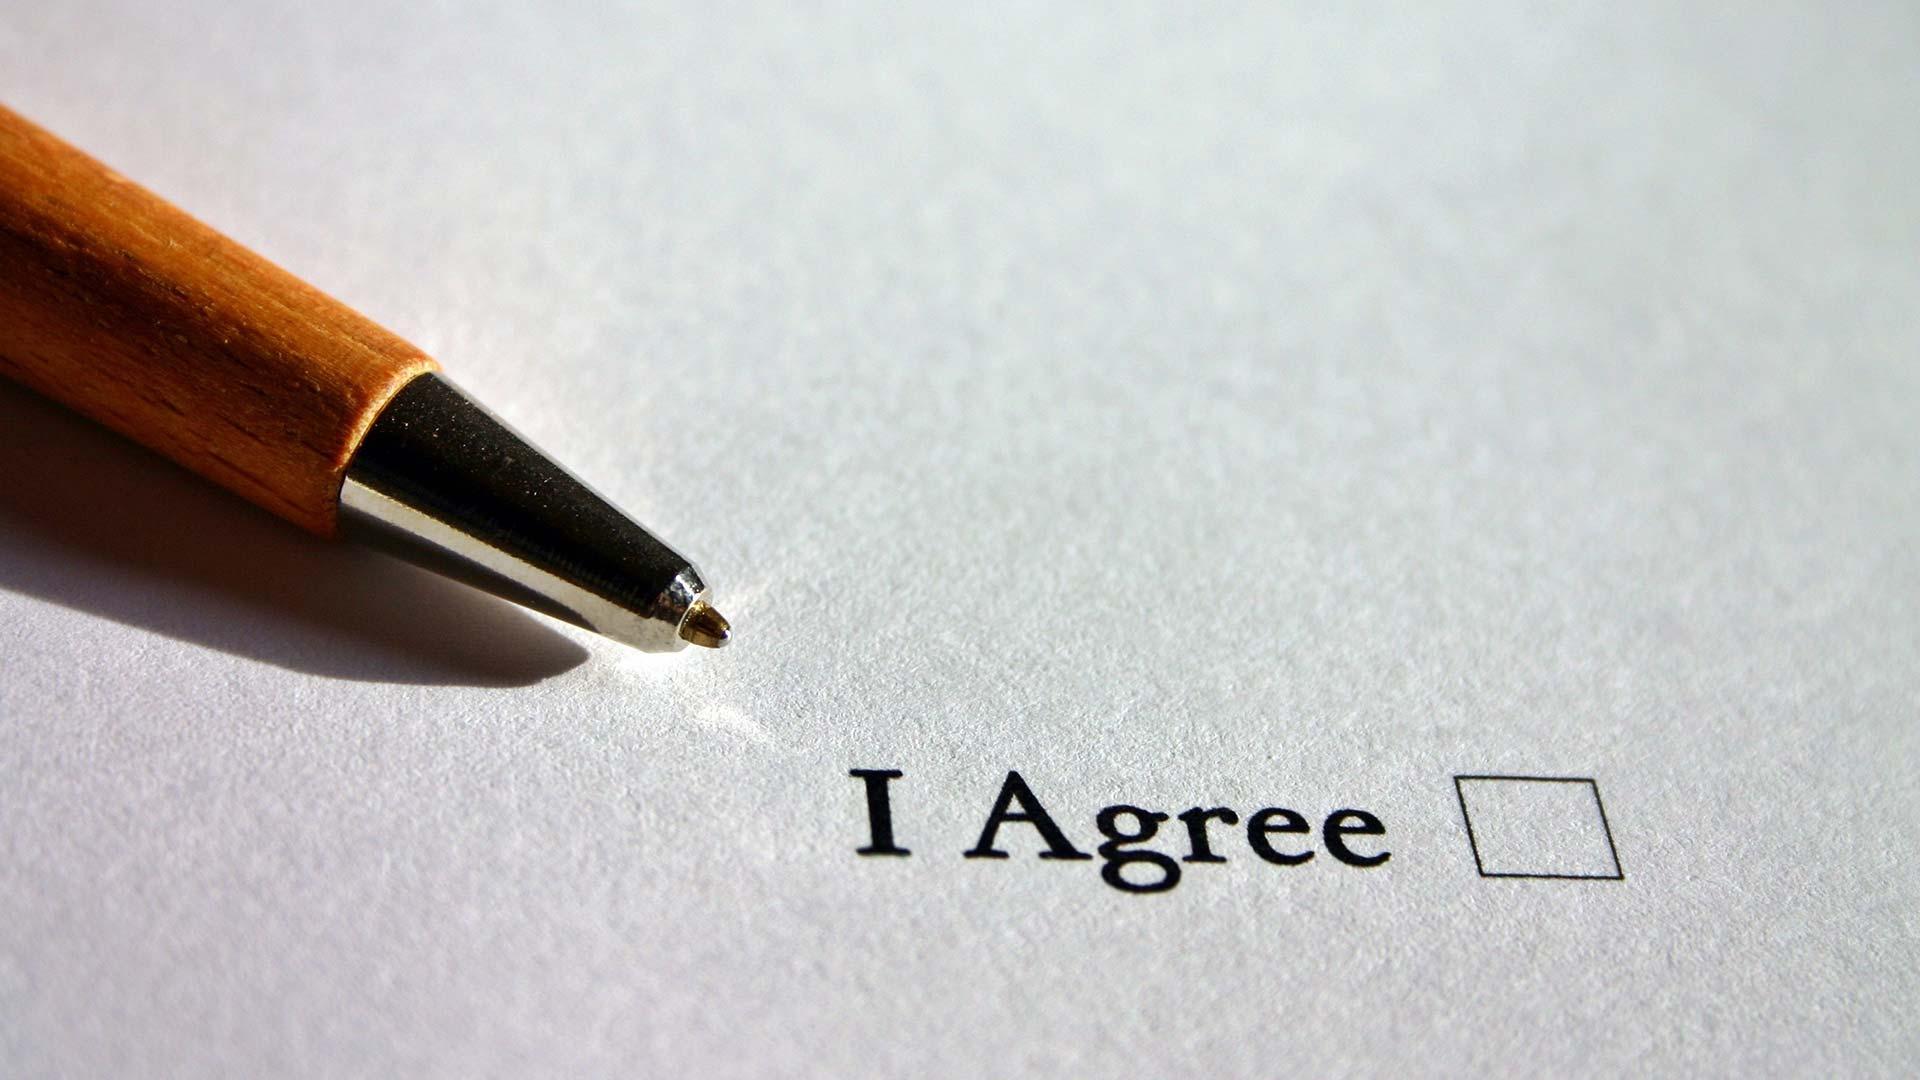 agree agreement